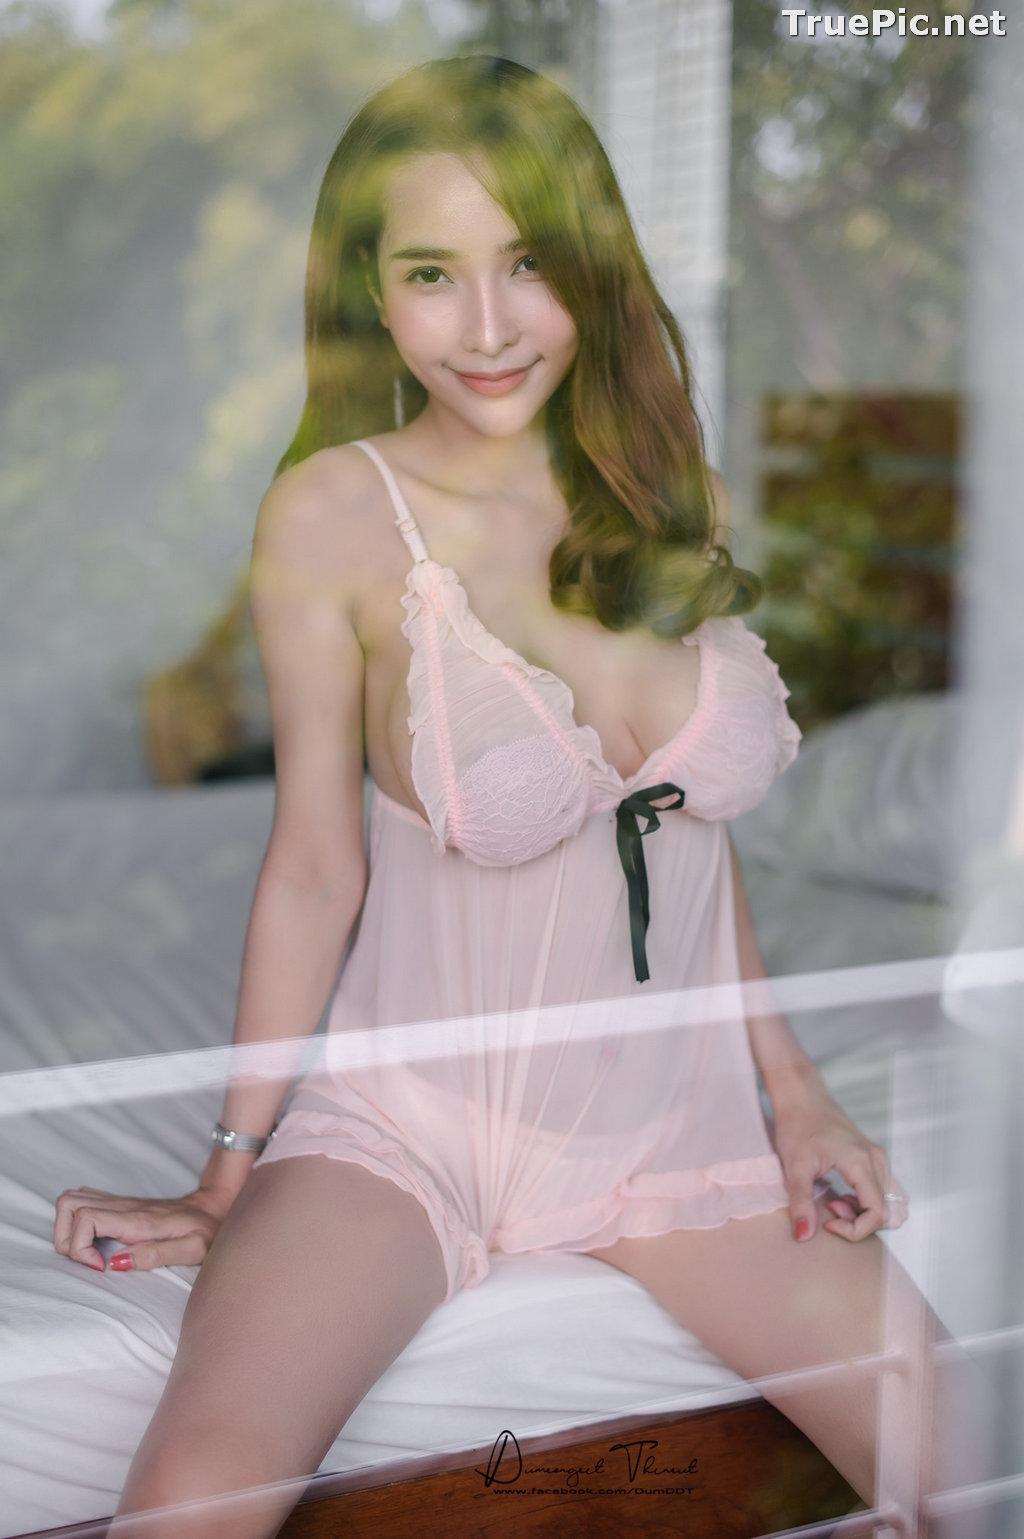 Image Thailand Model - Thanyalak Phantan - Cherry Pink Love - TruePic.net - Picture-10